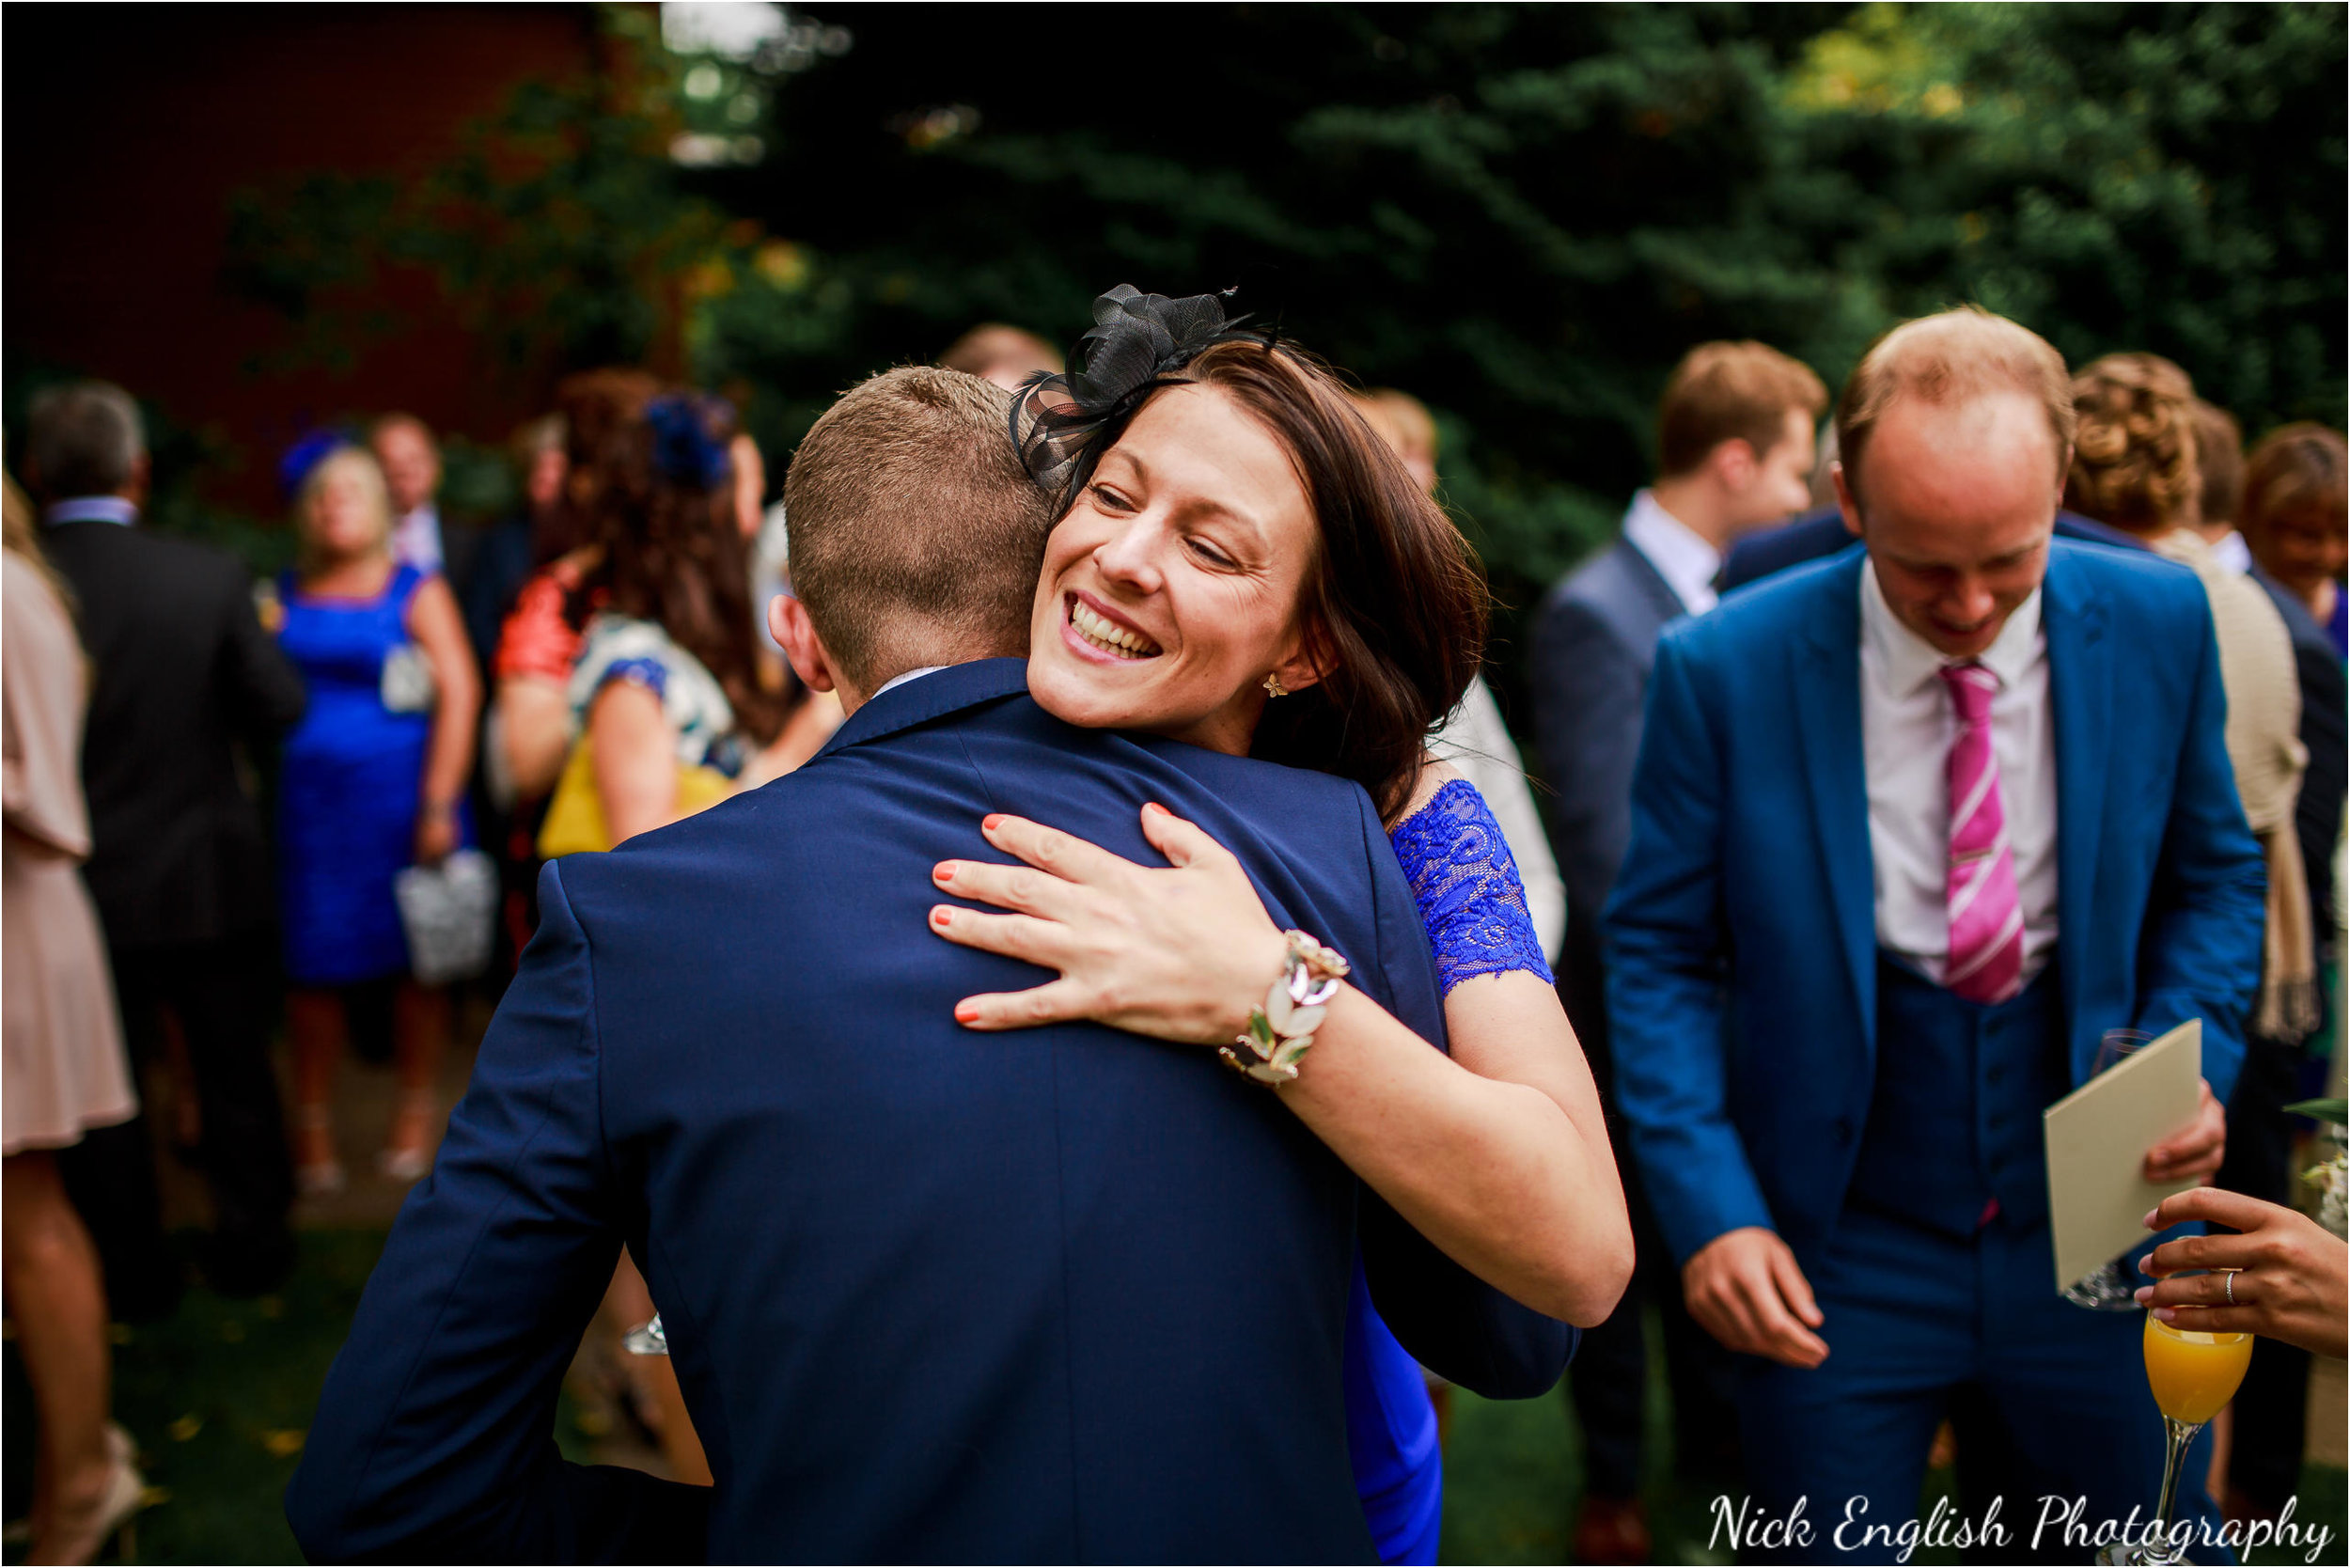 Emily David Wedding Photographs at Barton Grange Preston by Nick English Photography 105jpg.jpeg